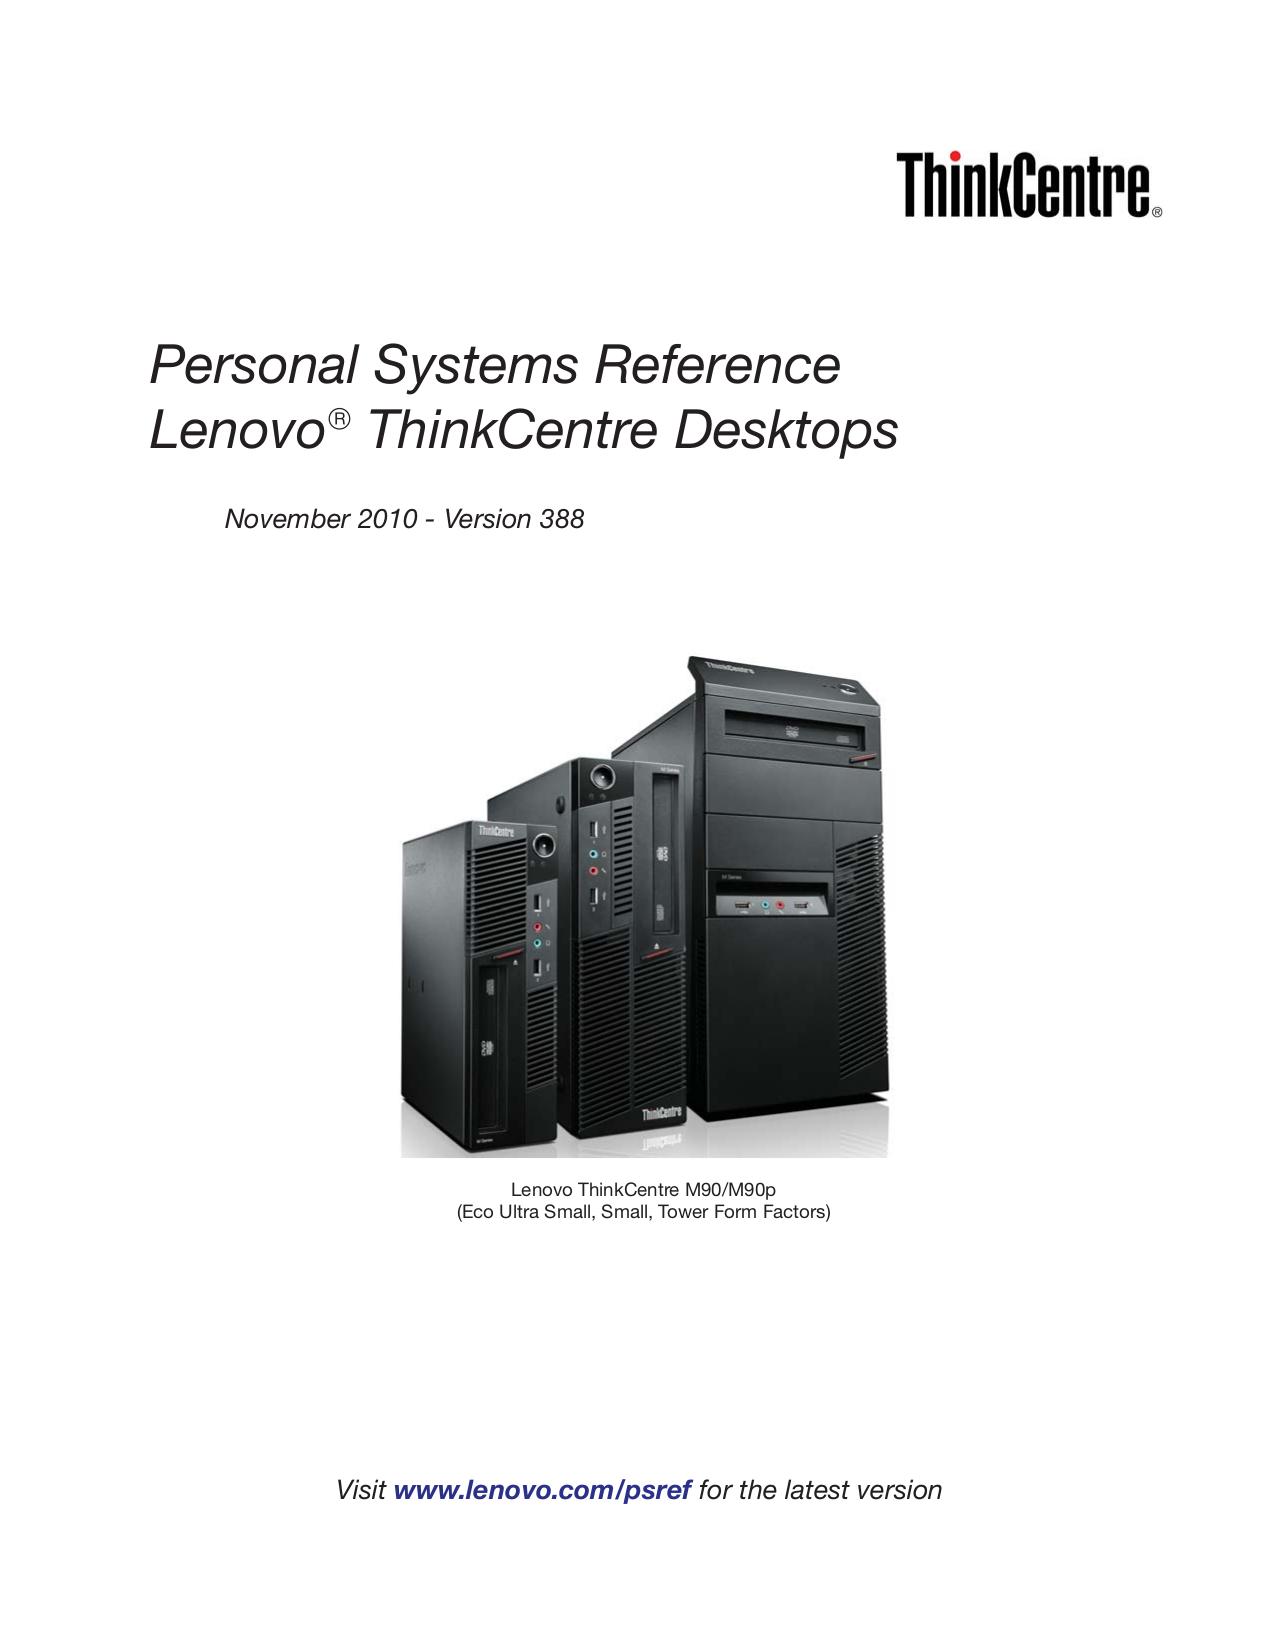 pdf for Lenovo Desktop ThinkCentre M90p 5864 manual